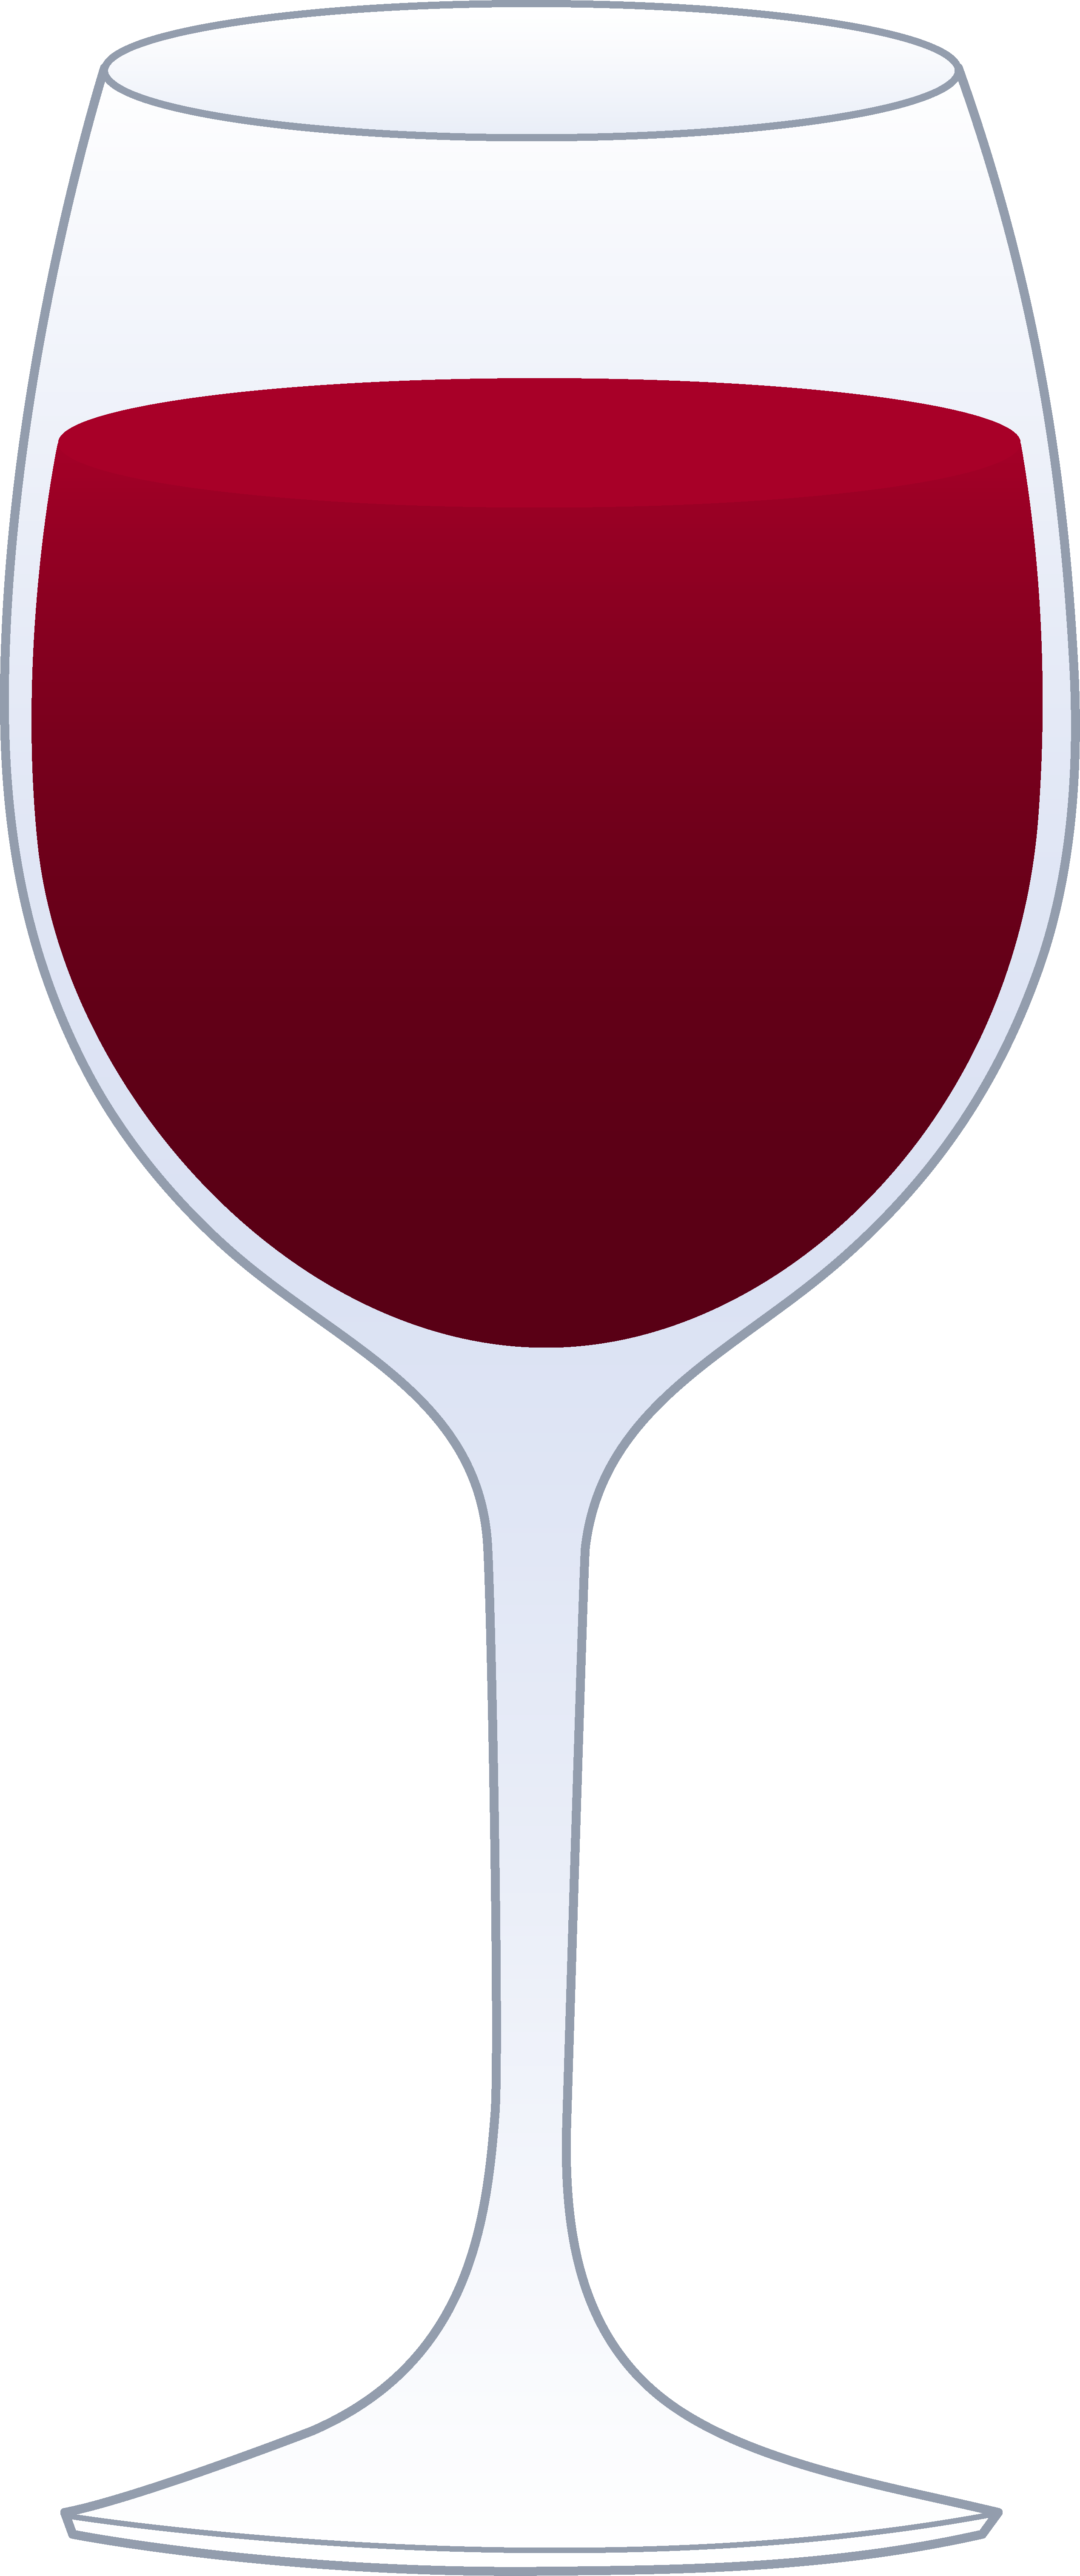 Free Wine Clip Art Image-Free Wine Clip Art Image-0